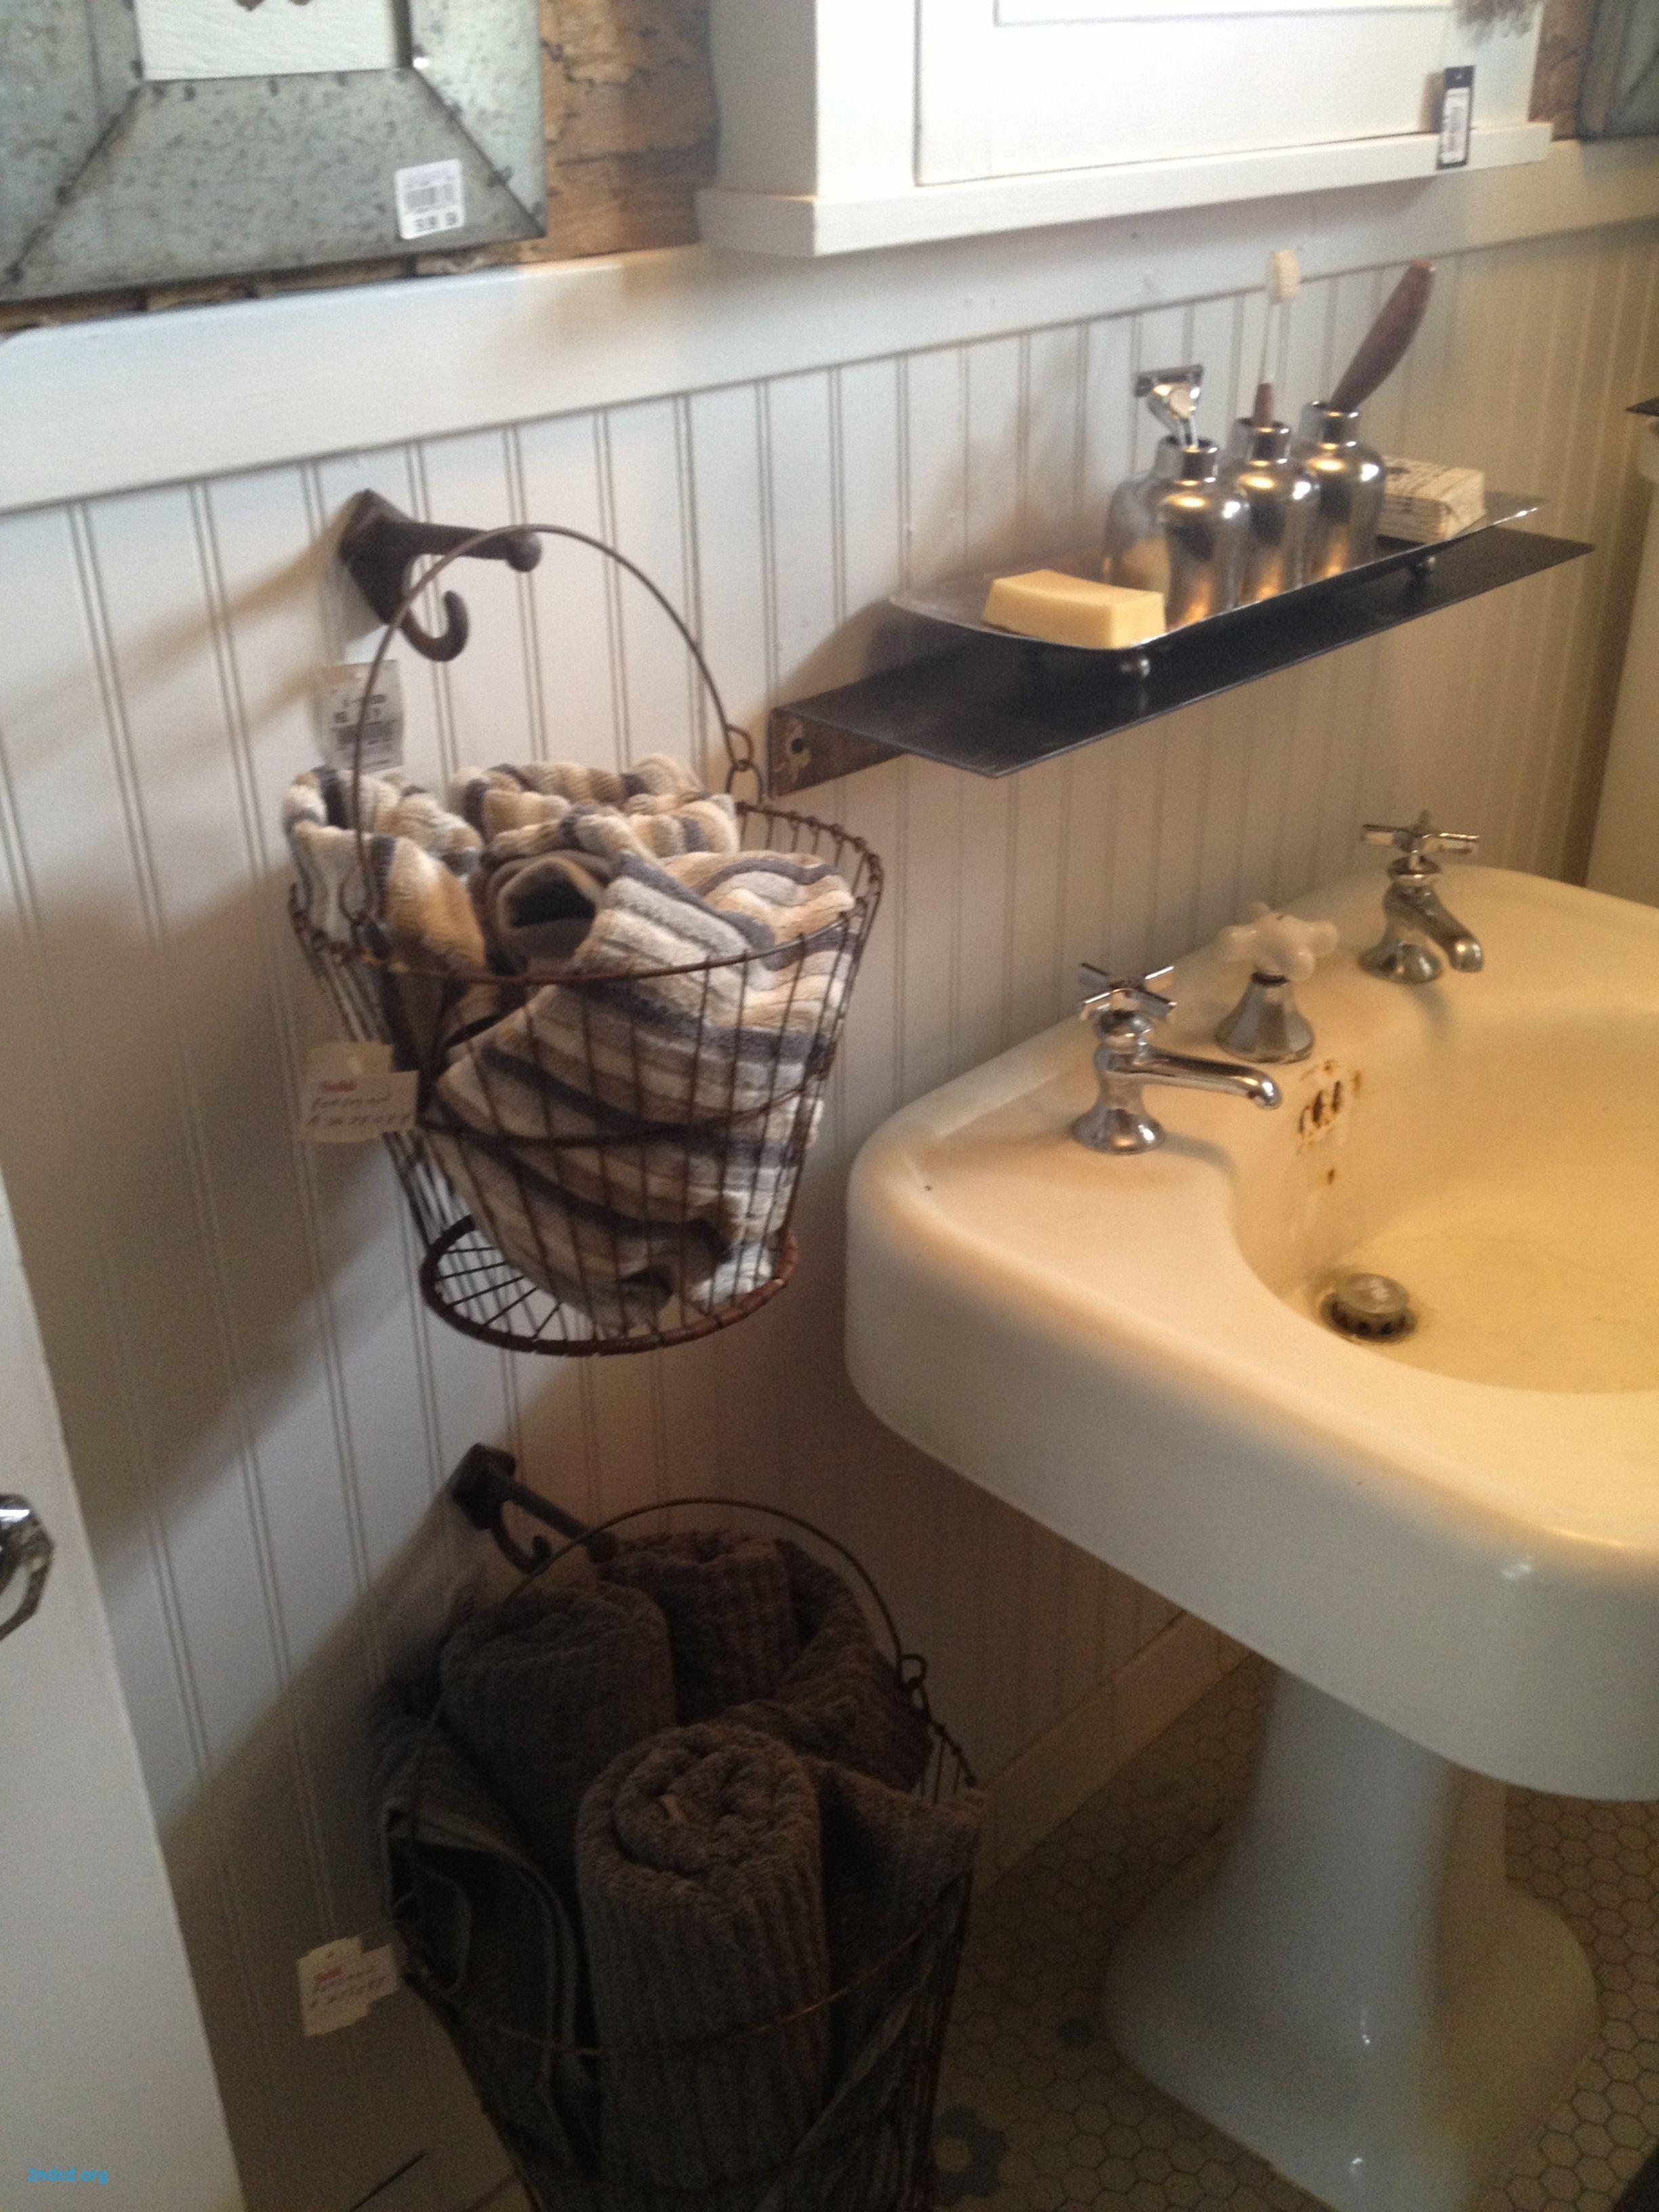 Best Of Storage Ideas for Bathroom with Pedestal Sink ...